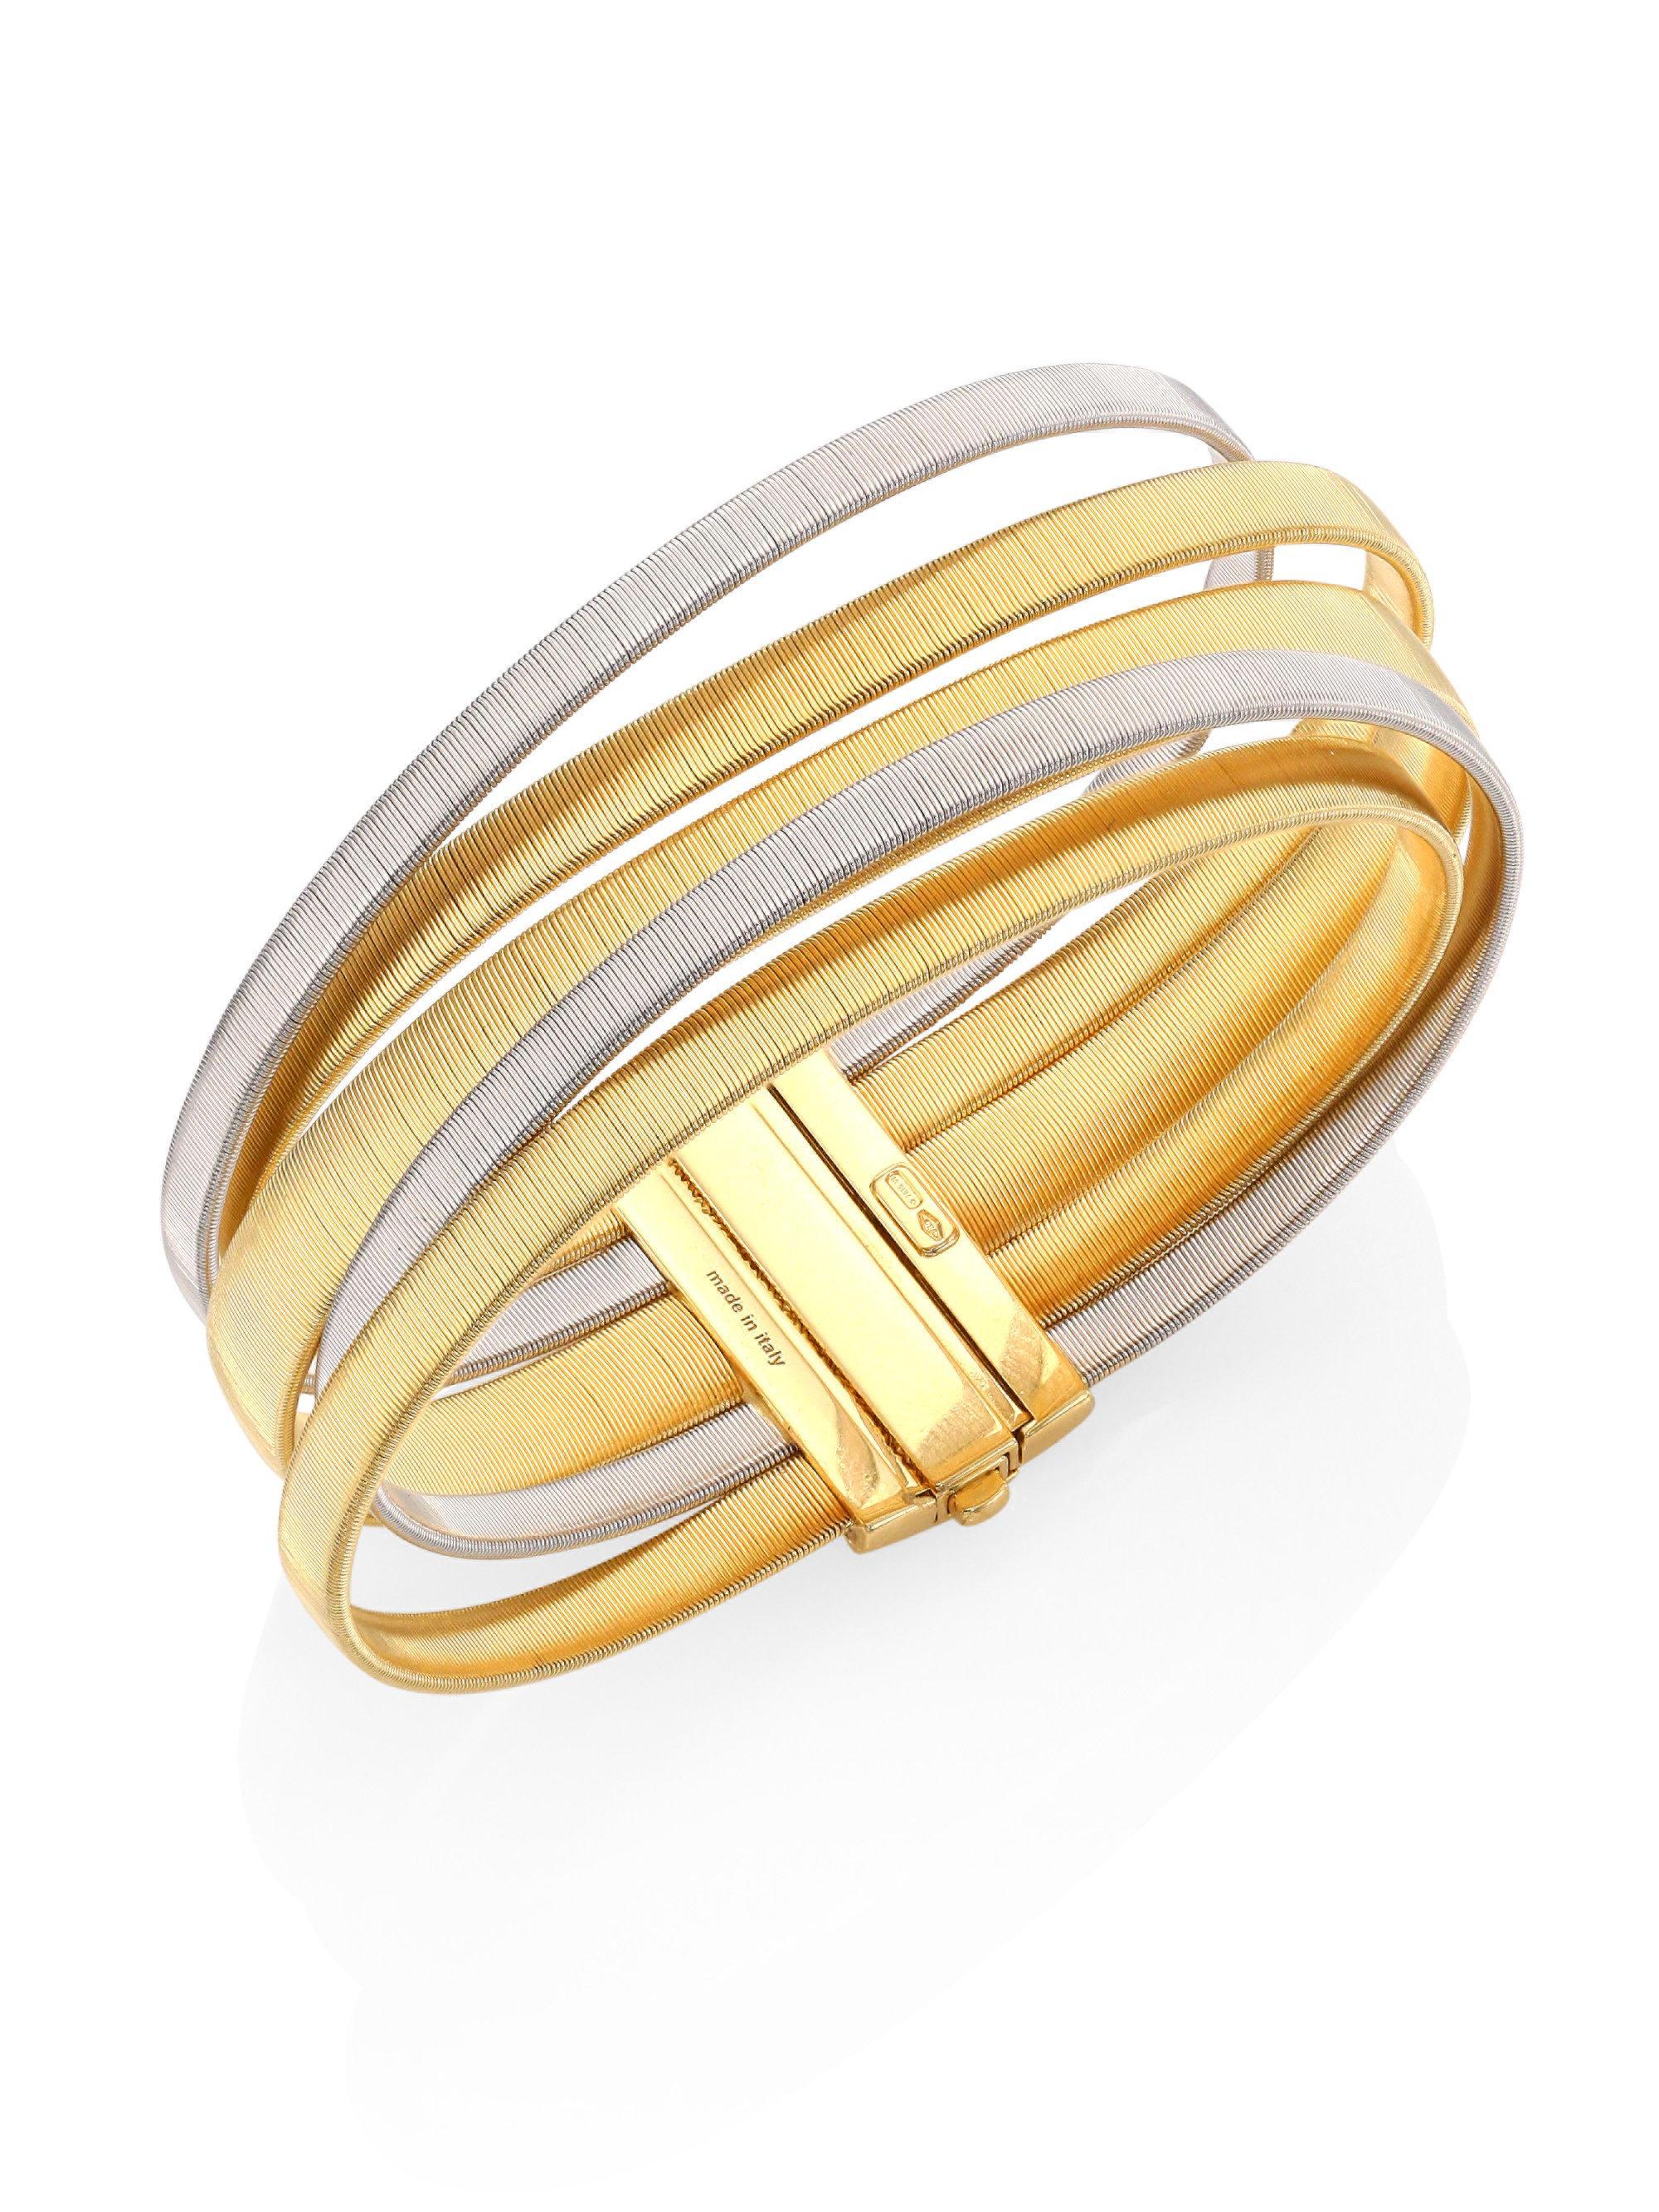 Marco Bicego Masai 18K Yellow & White Gold Five-Strand Bracelet OkbTp